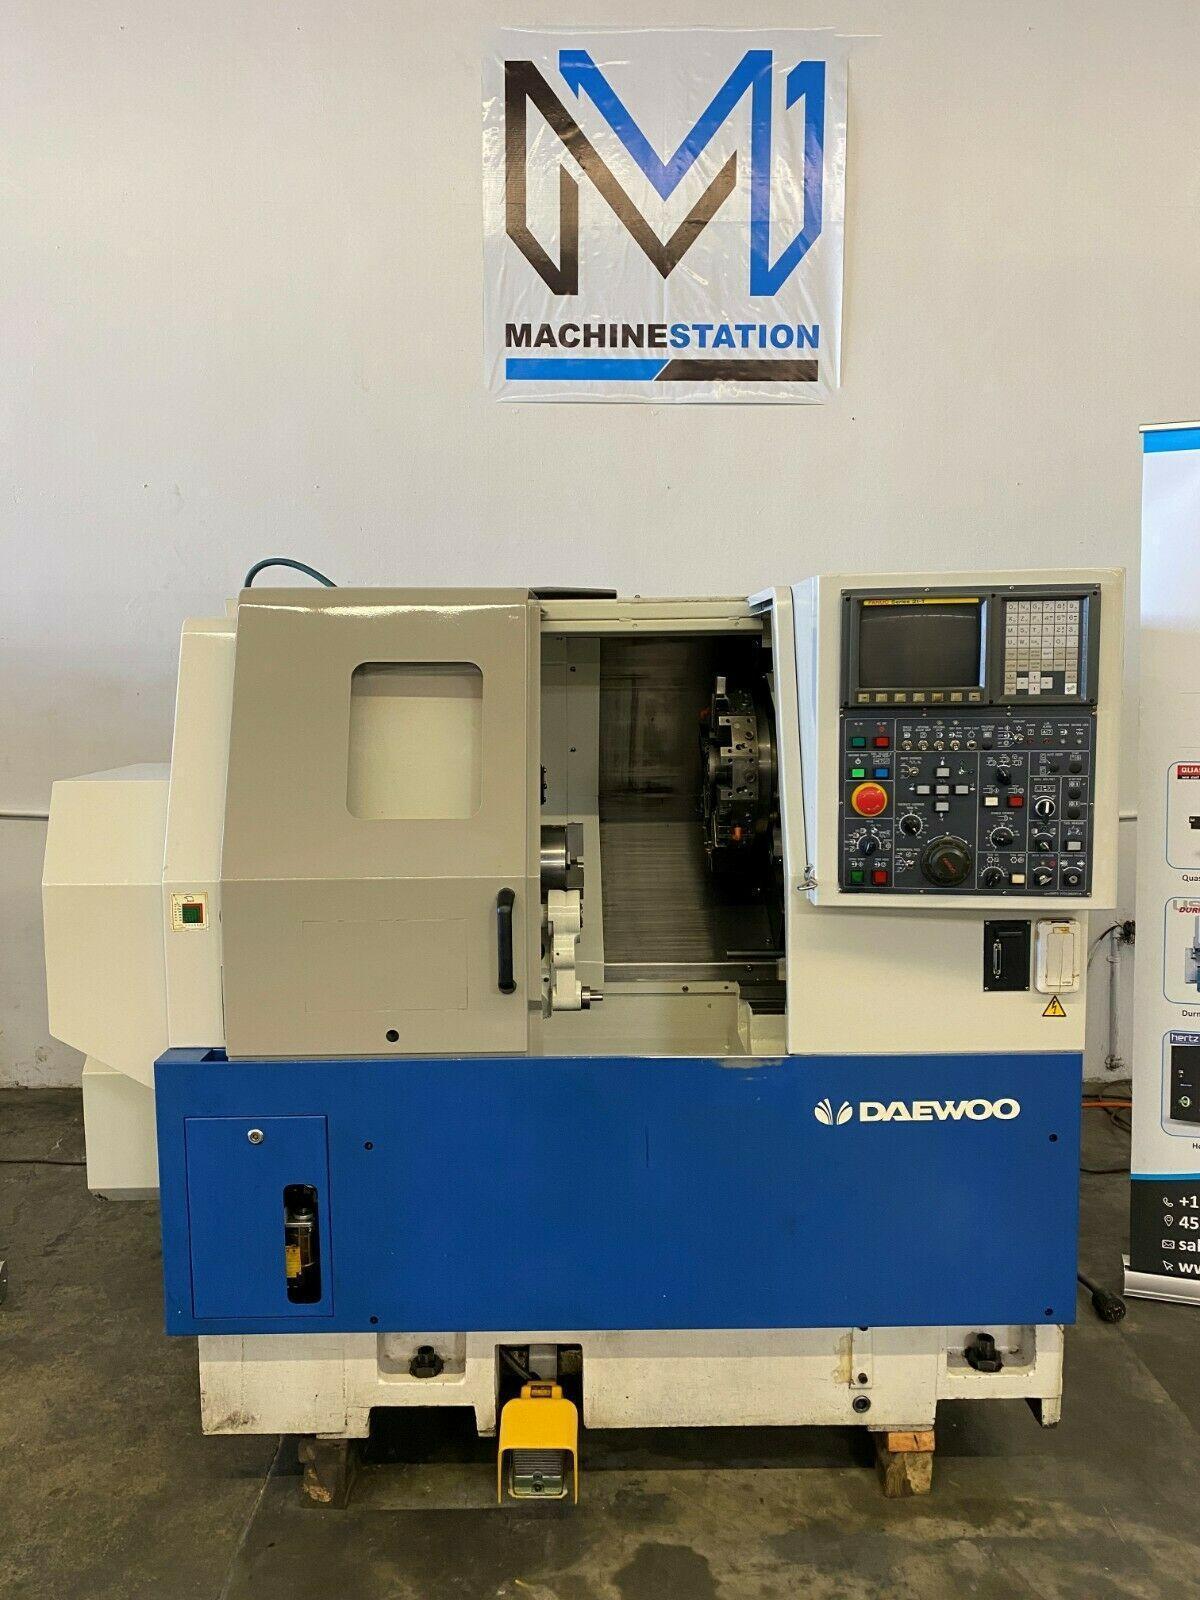 Daewoo Lynx 200 CNC Turning Center